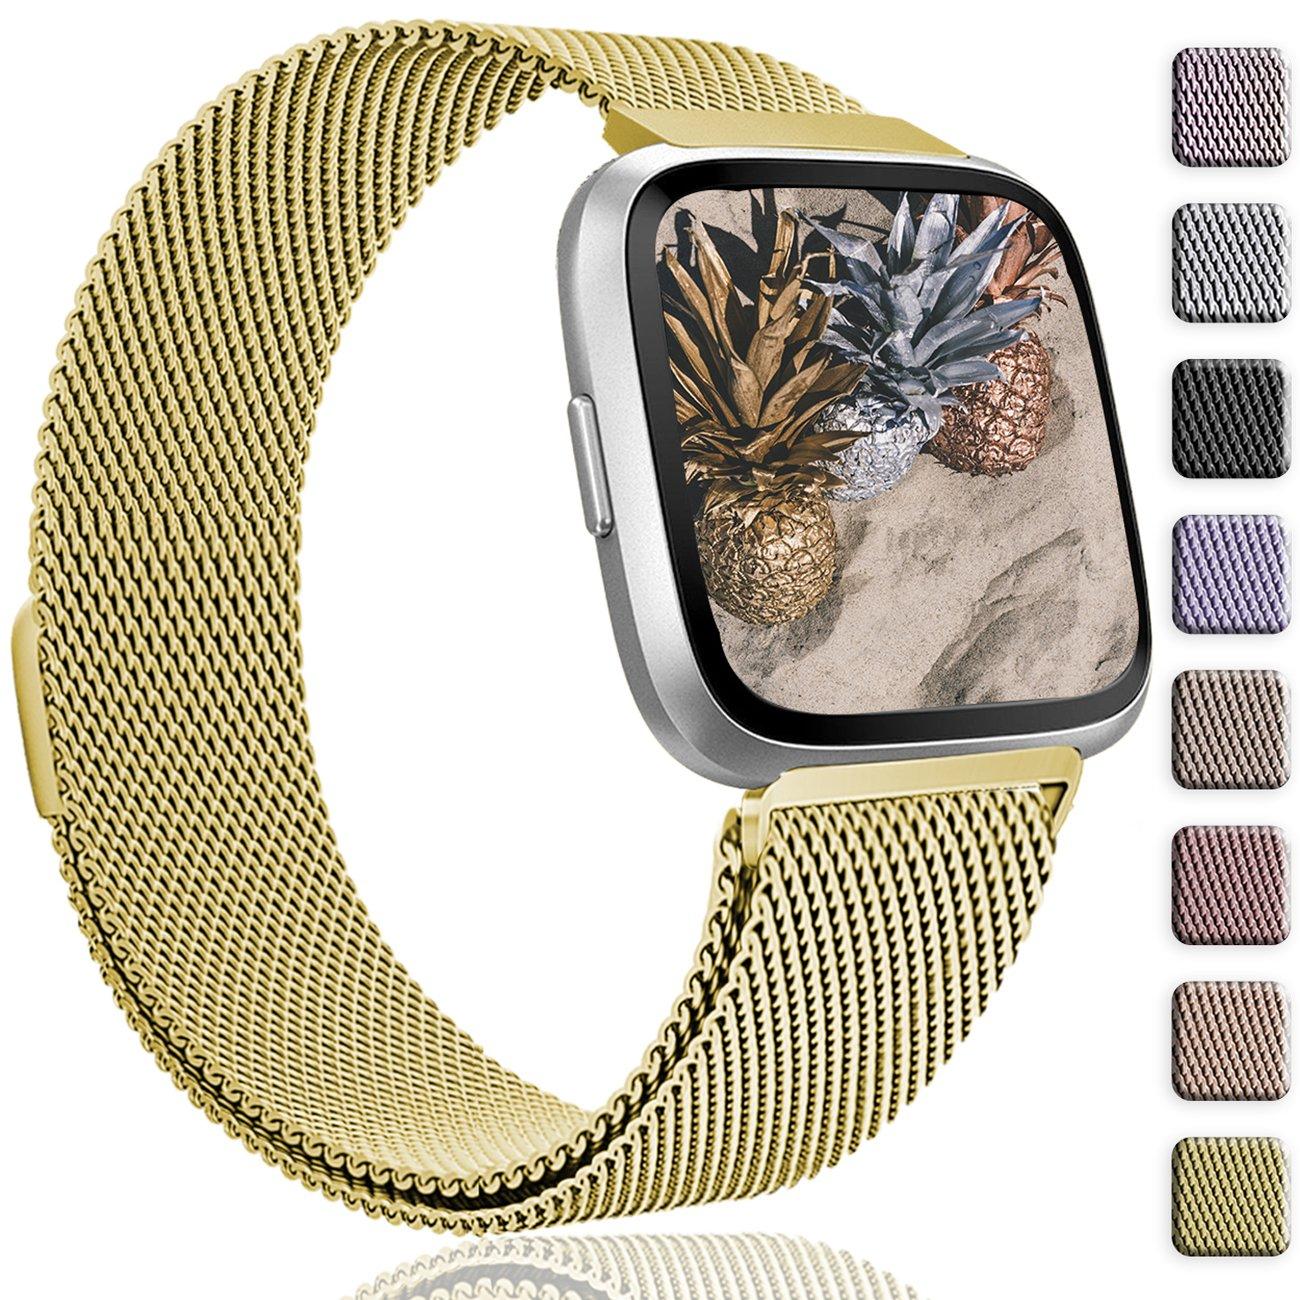 Wepro Fitbit Versaバンド交換用forレディースメンズSmall Large , Milanese Loopステンレススチールメタルブレスレットストラップwith UniqueマグネットロックアクセサリーWristbands for Fitbit Versa Smart Watch B07BM72D6Y #08-Gold Large 6.7\